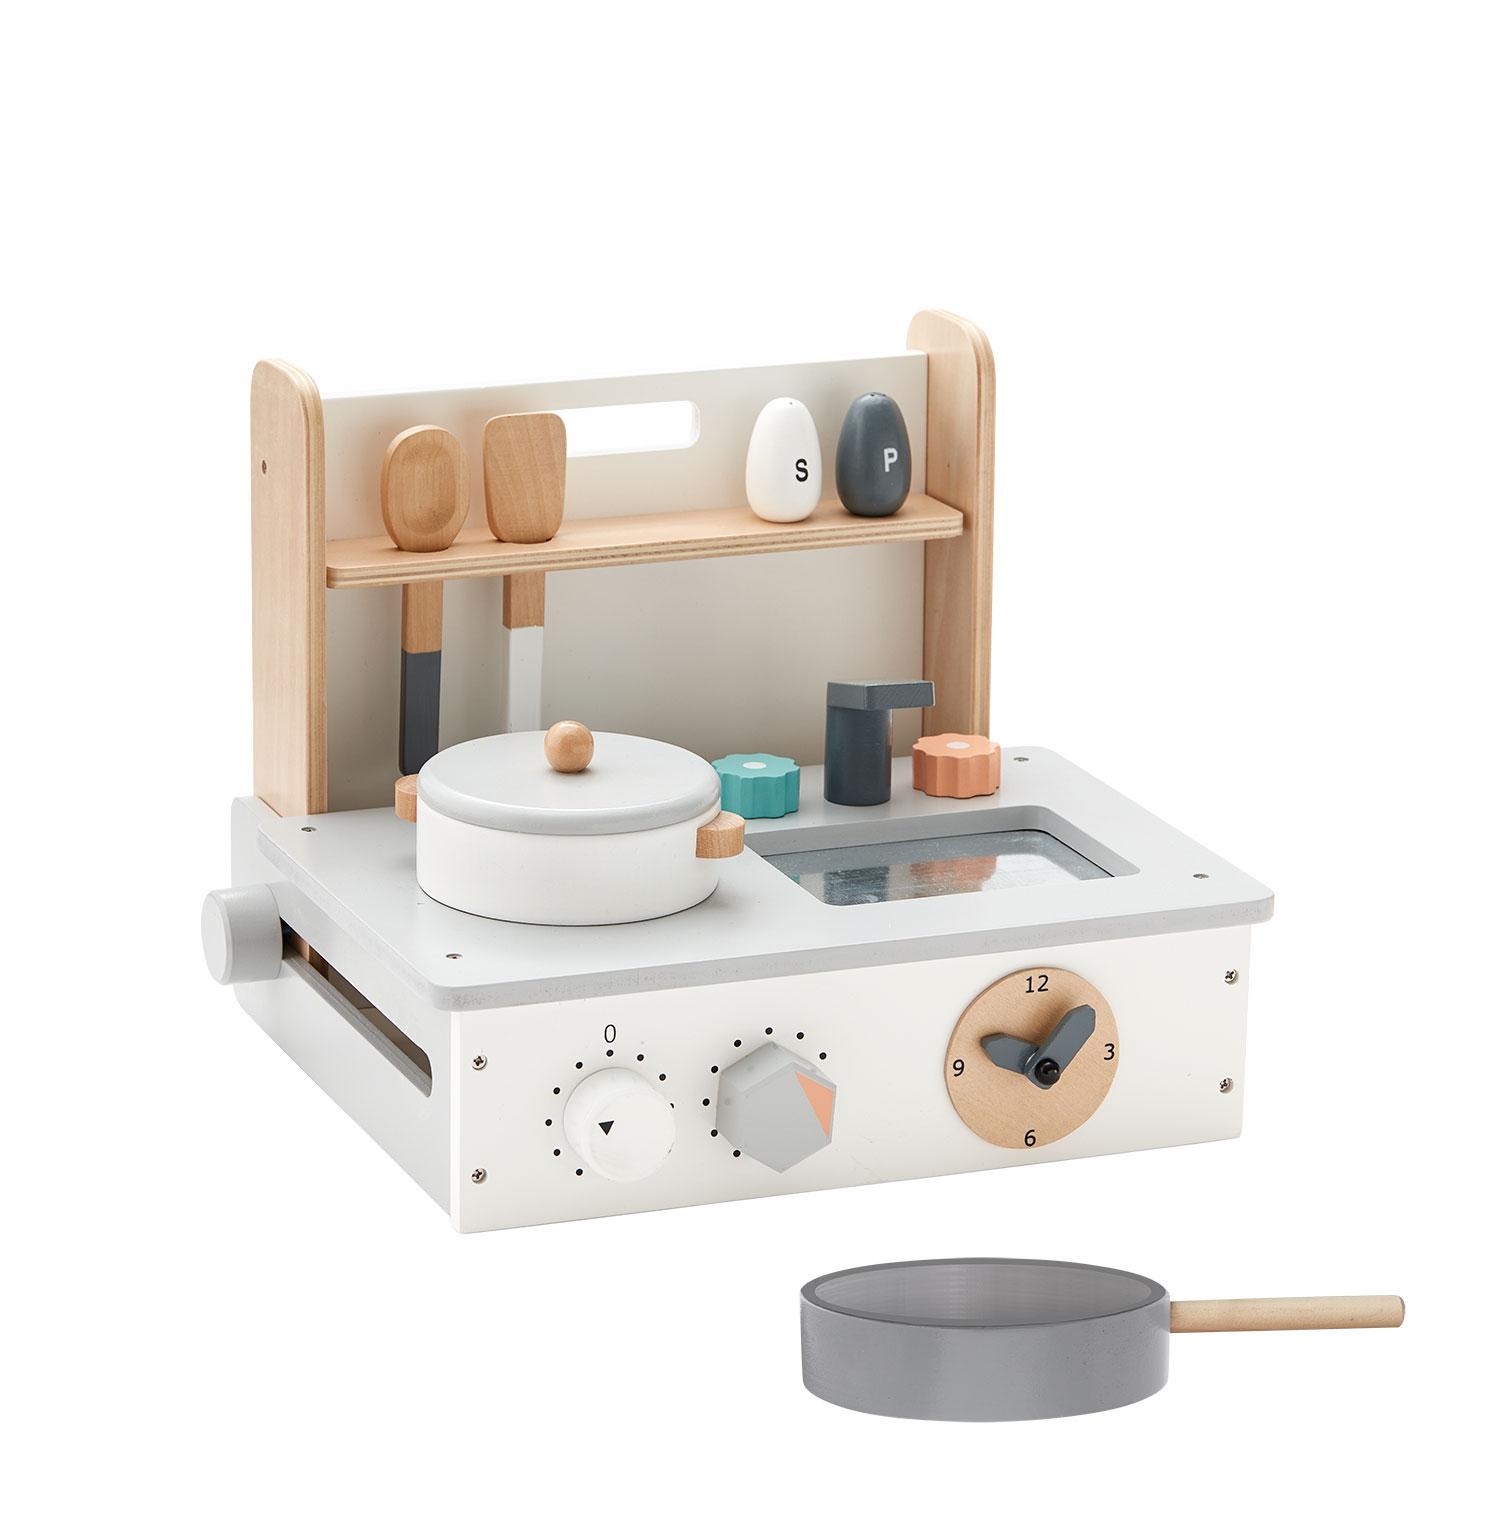 kids concept //木製おもちゃのミニキッチン